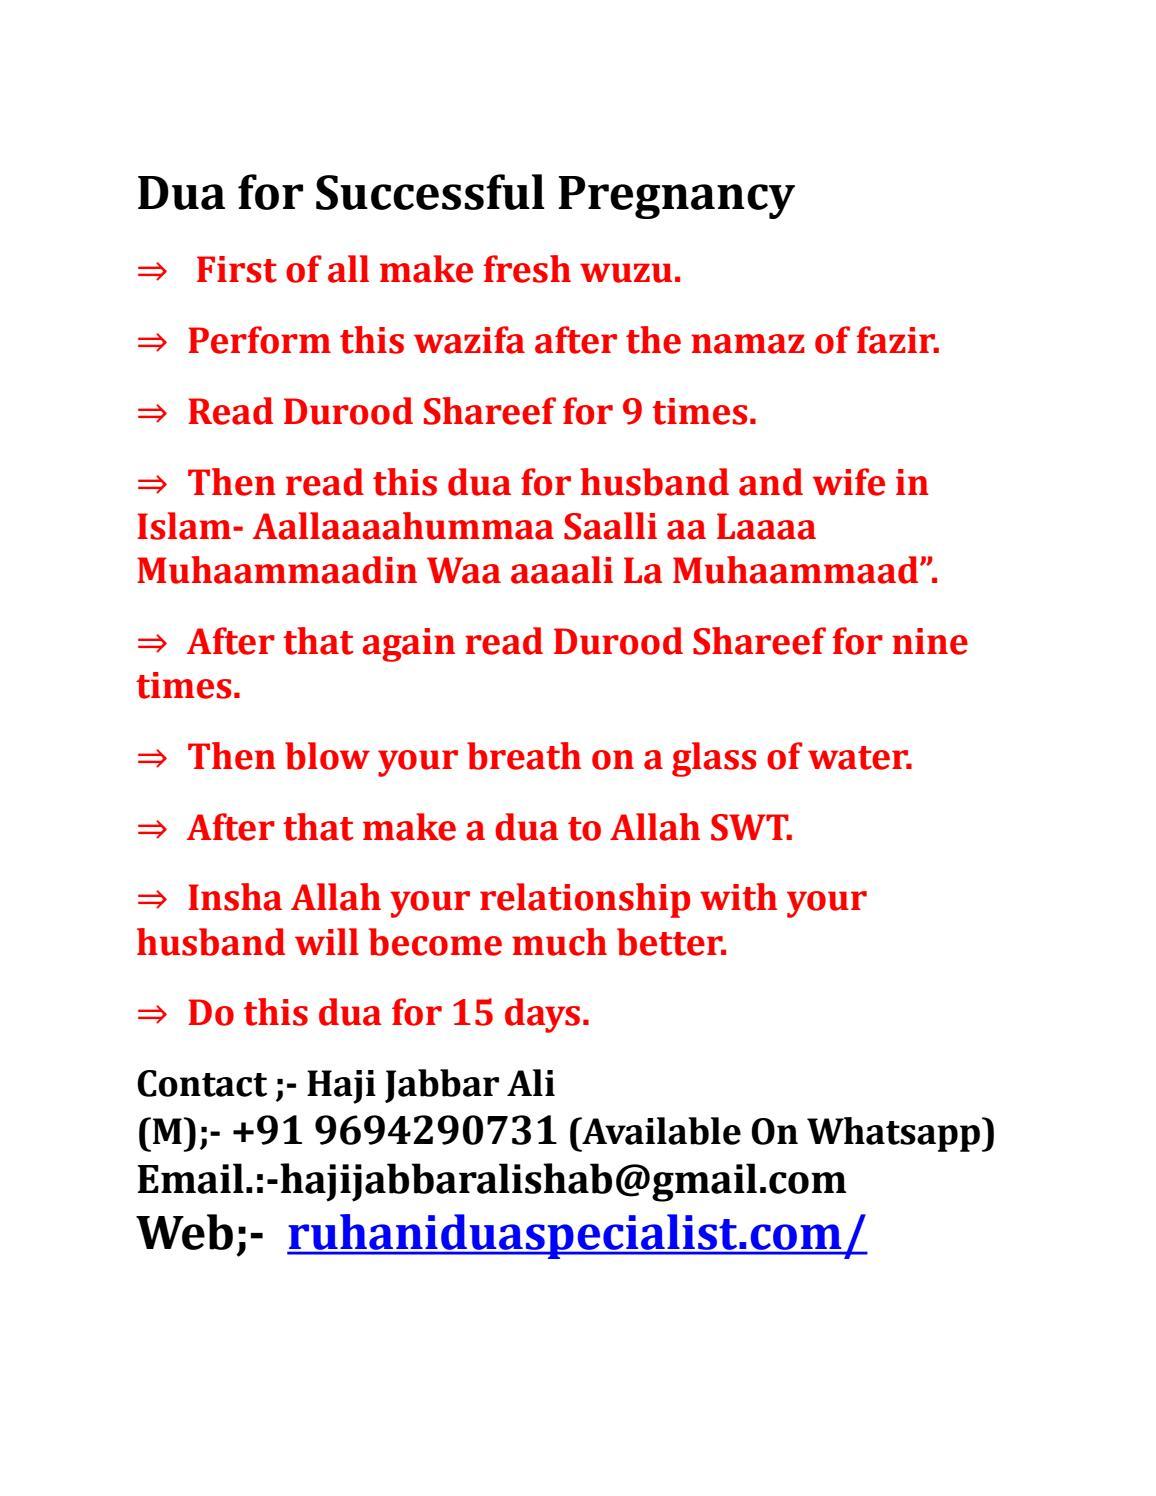 Powerful Dua for Successful Pregnancy by Powerful Dua Wazifa